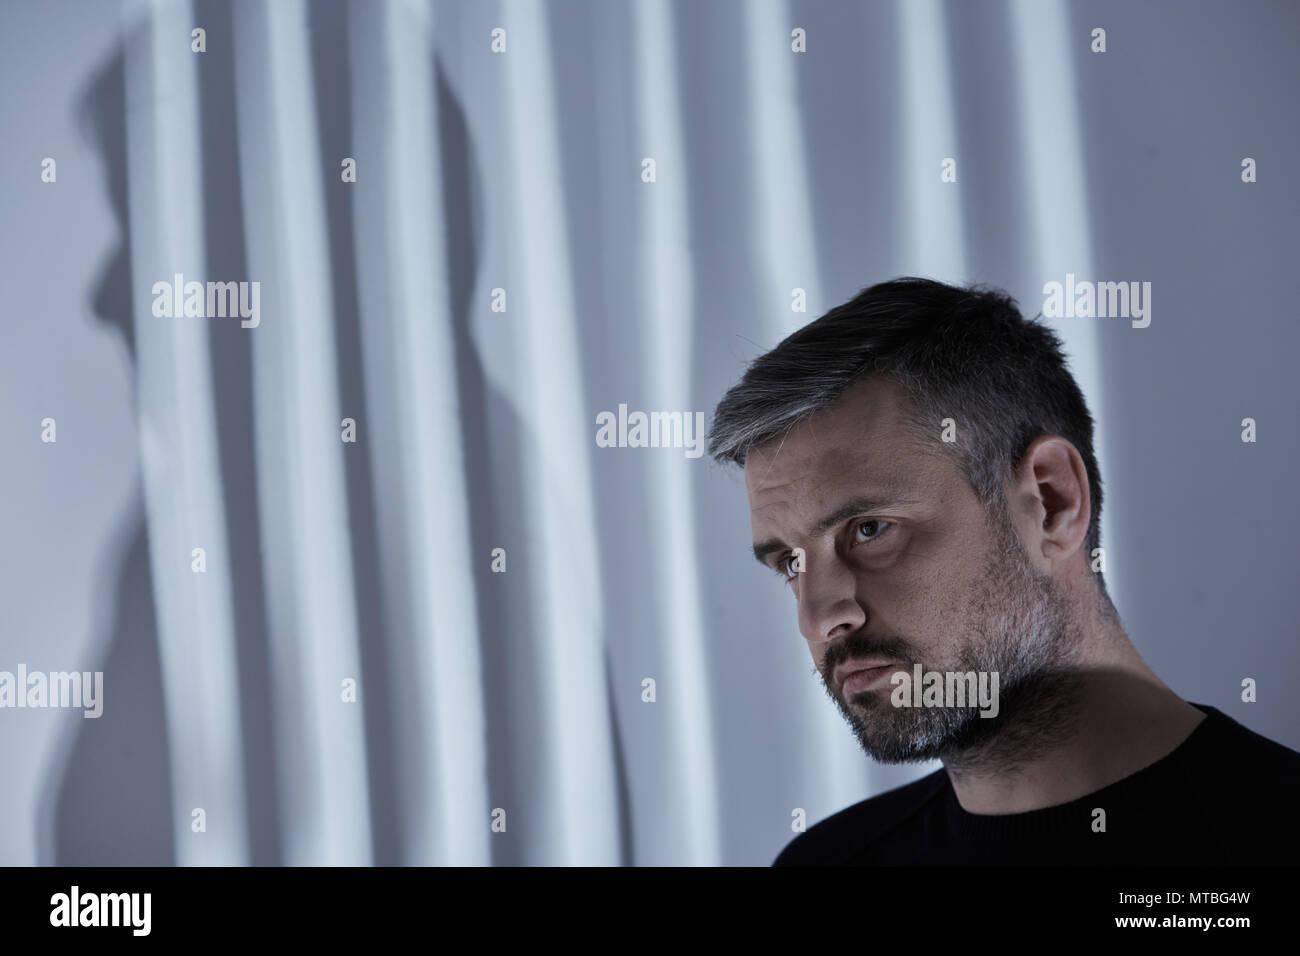 Broken man with depression in room interior - Stock Image